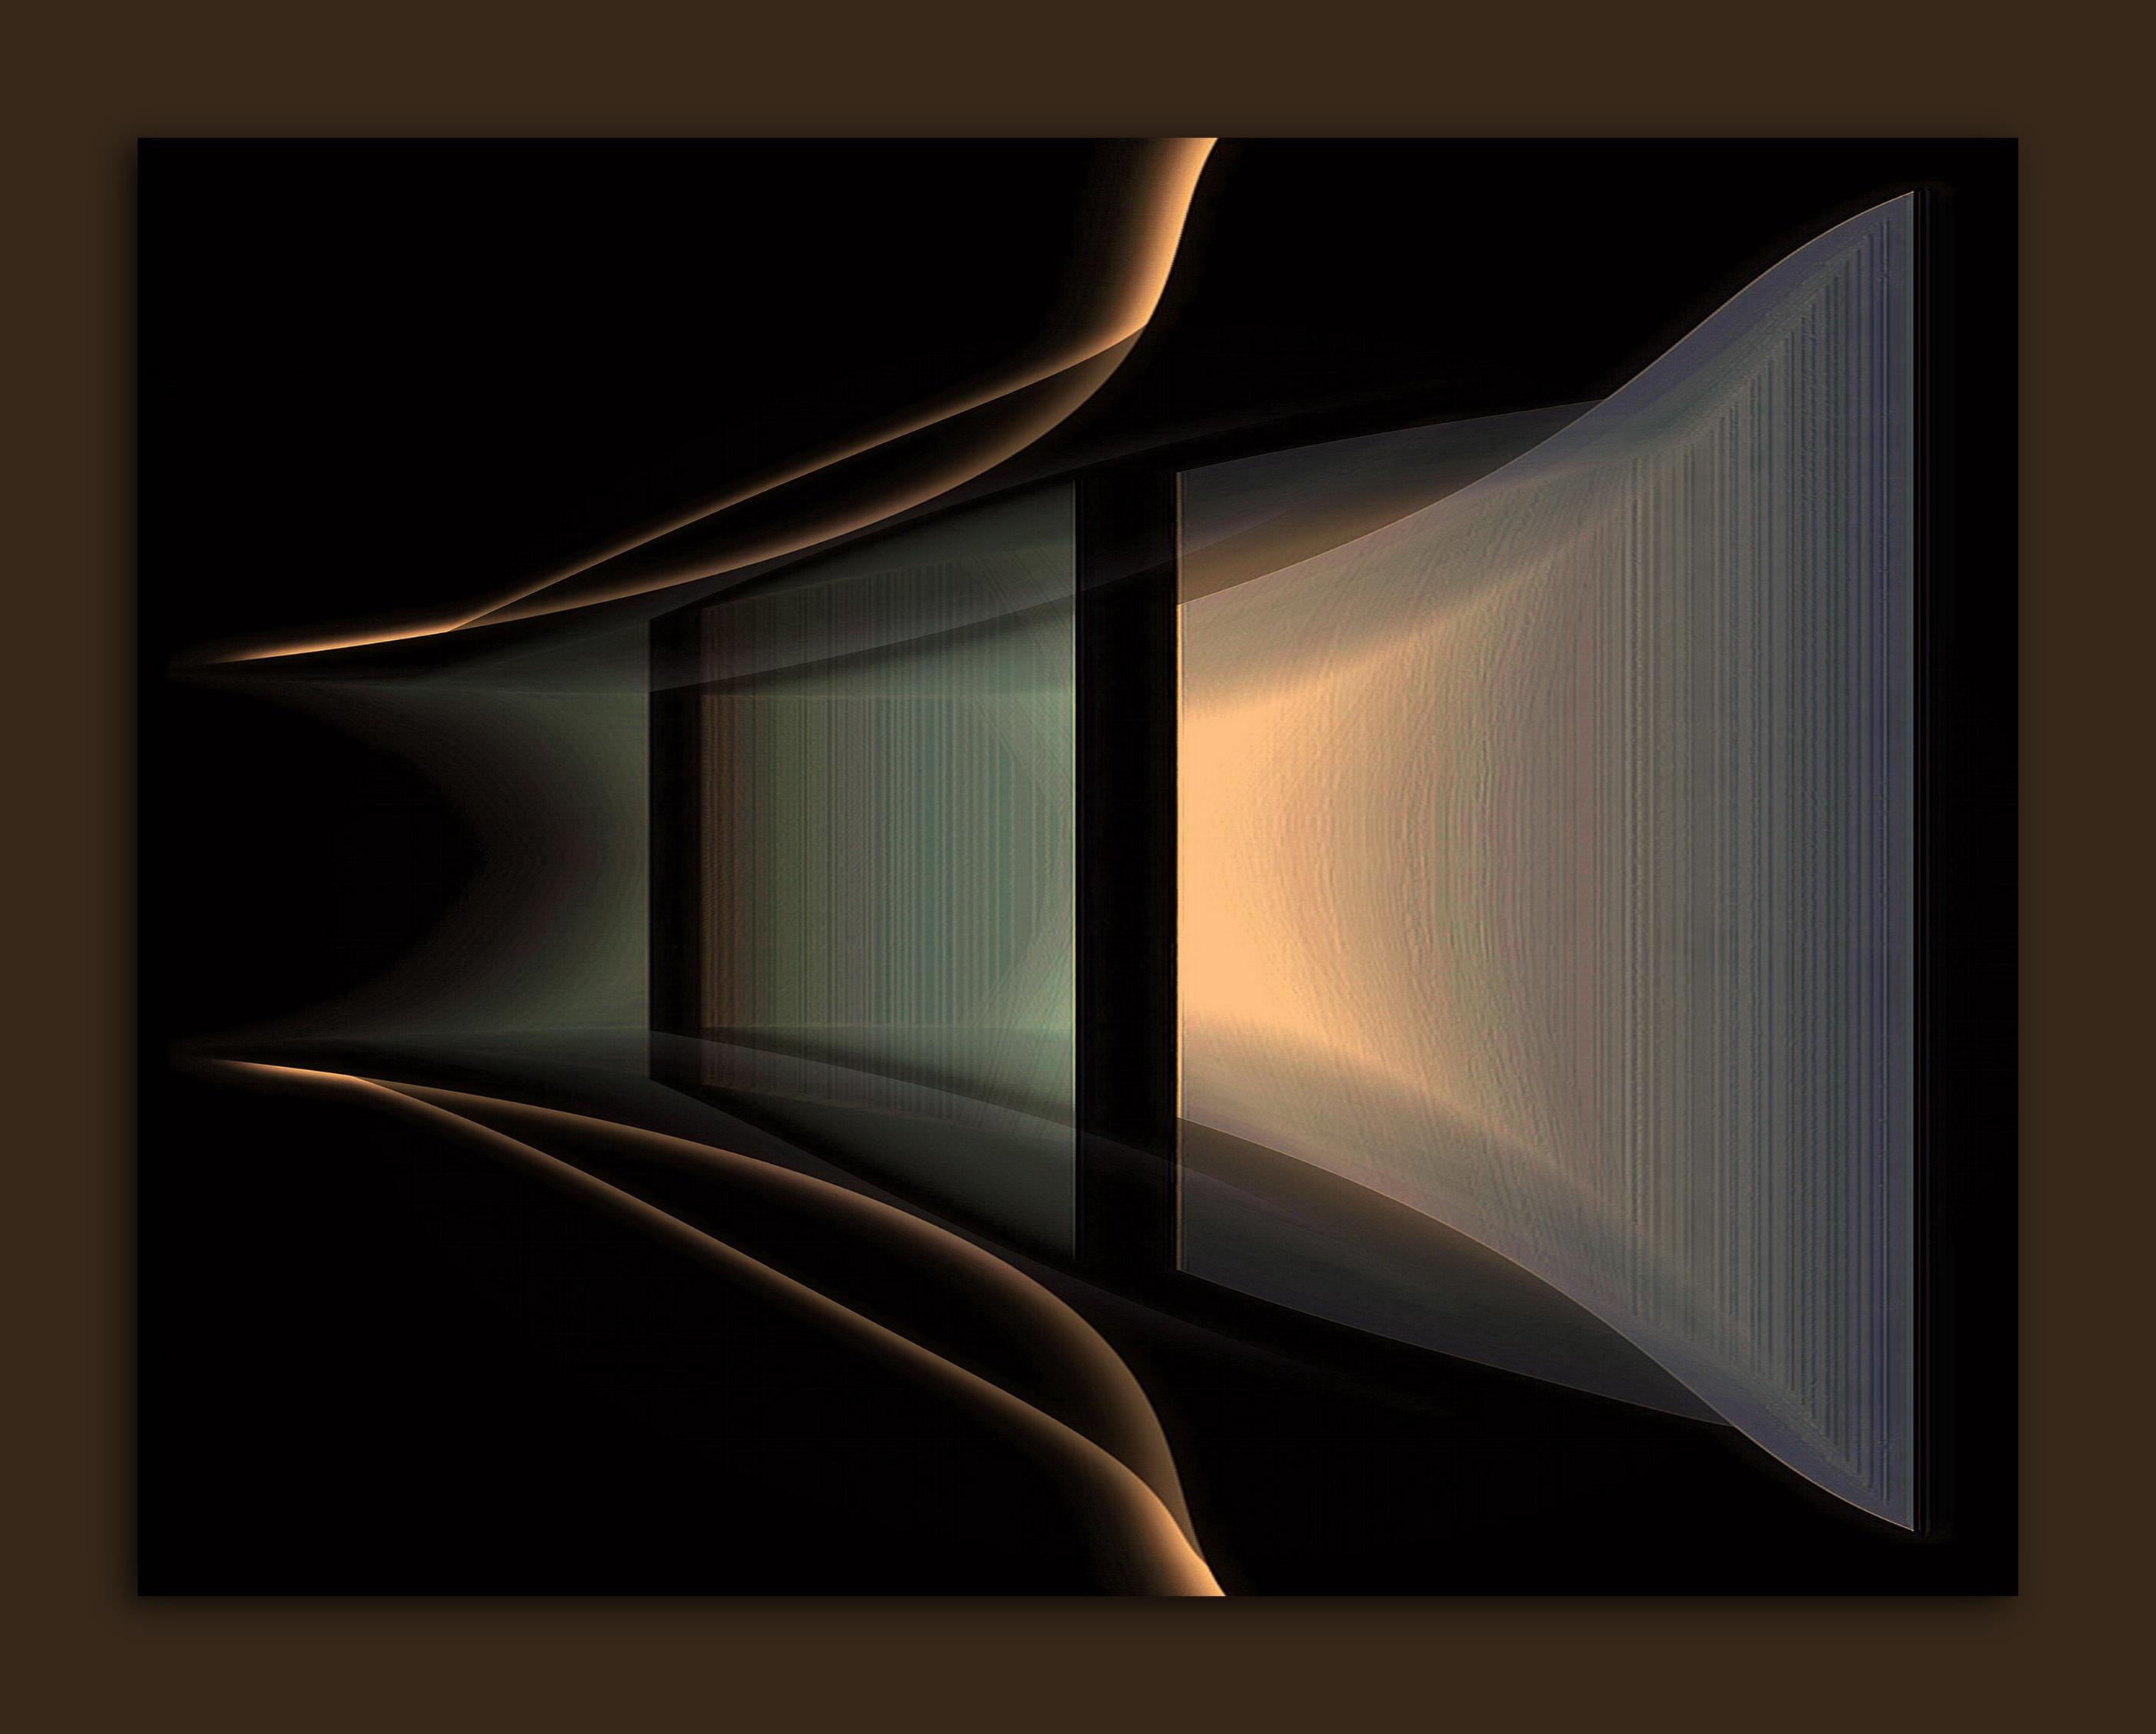 Hintergrundbilder : Illustration, abstrakt, Text, Symmetrie ...